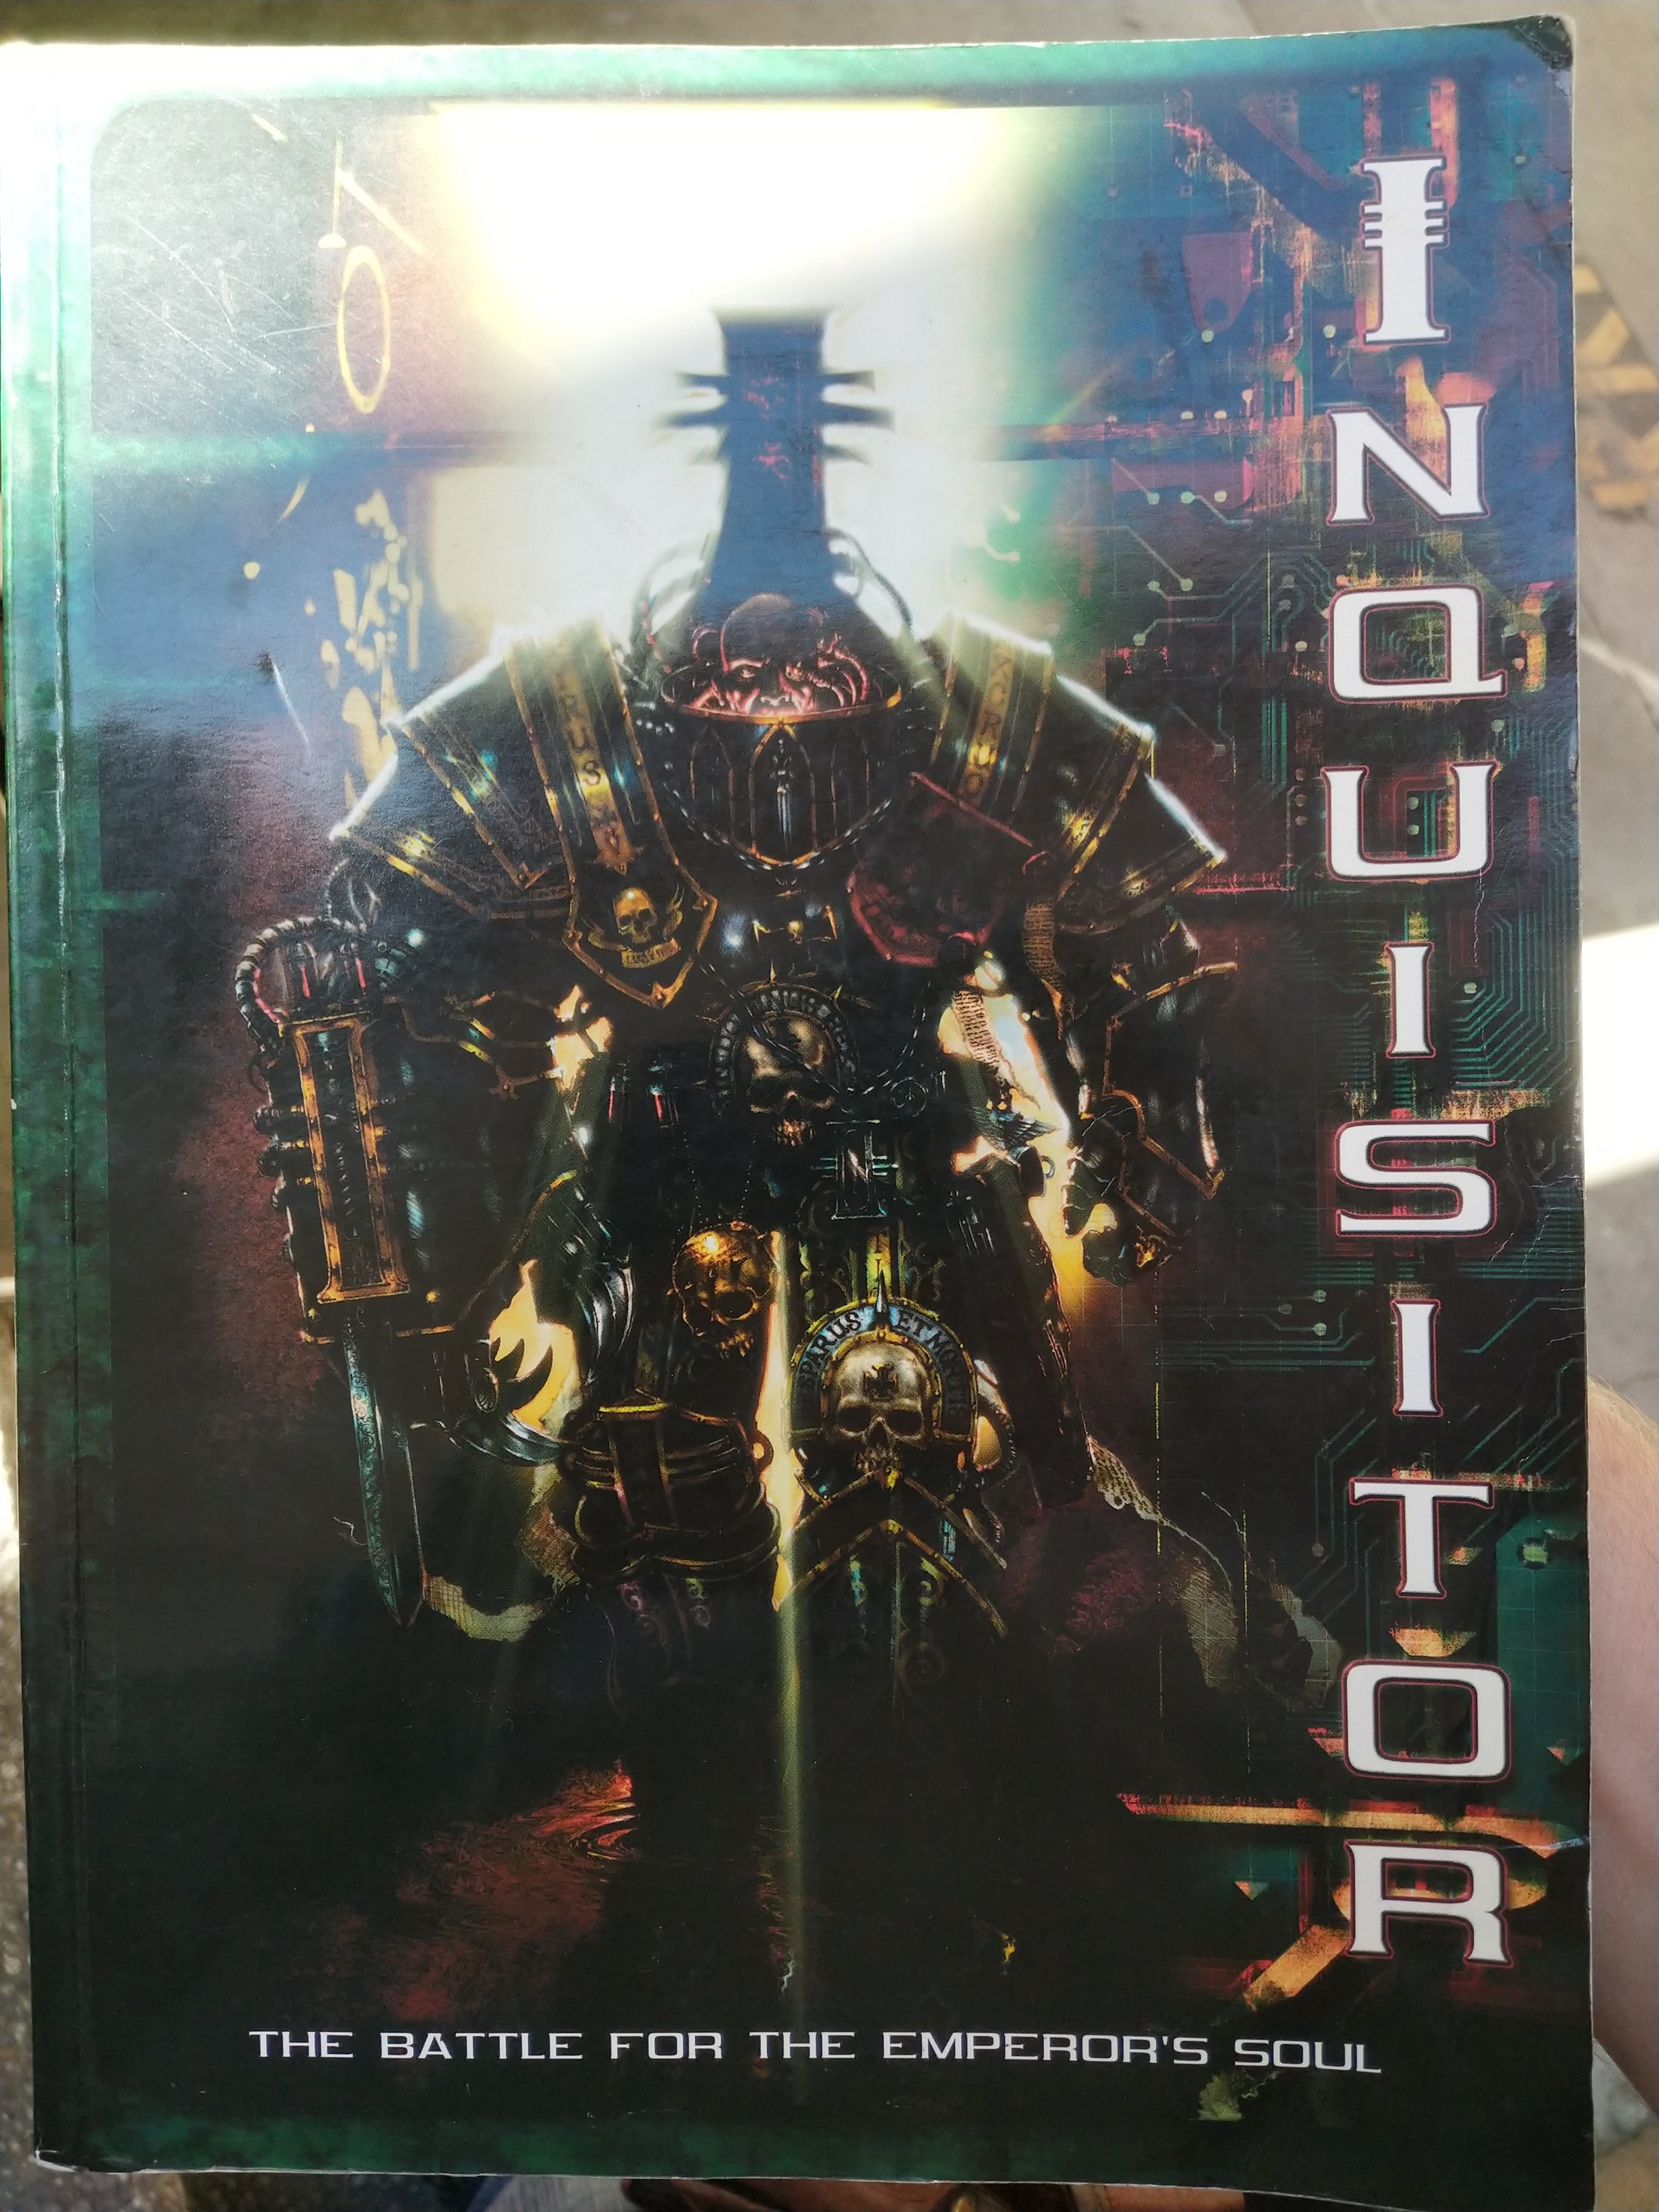 Warhammer 40K: Inquisitor - Martyr - Games - Quarter To